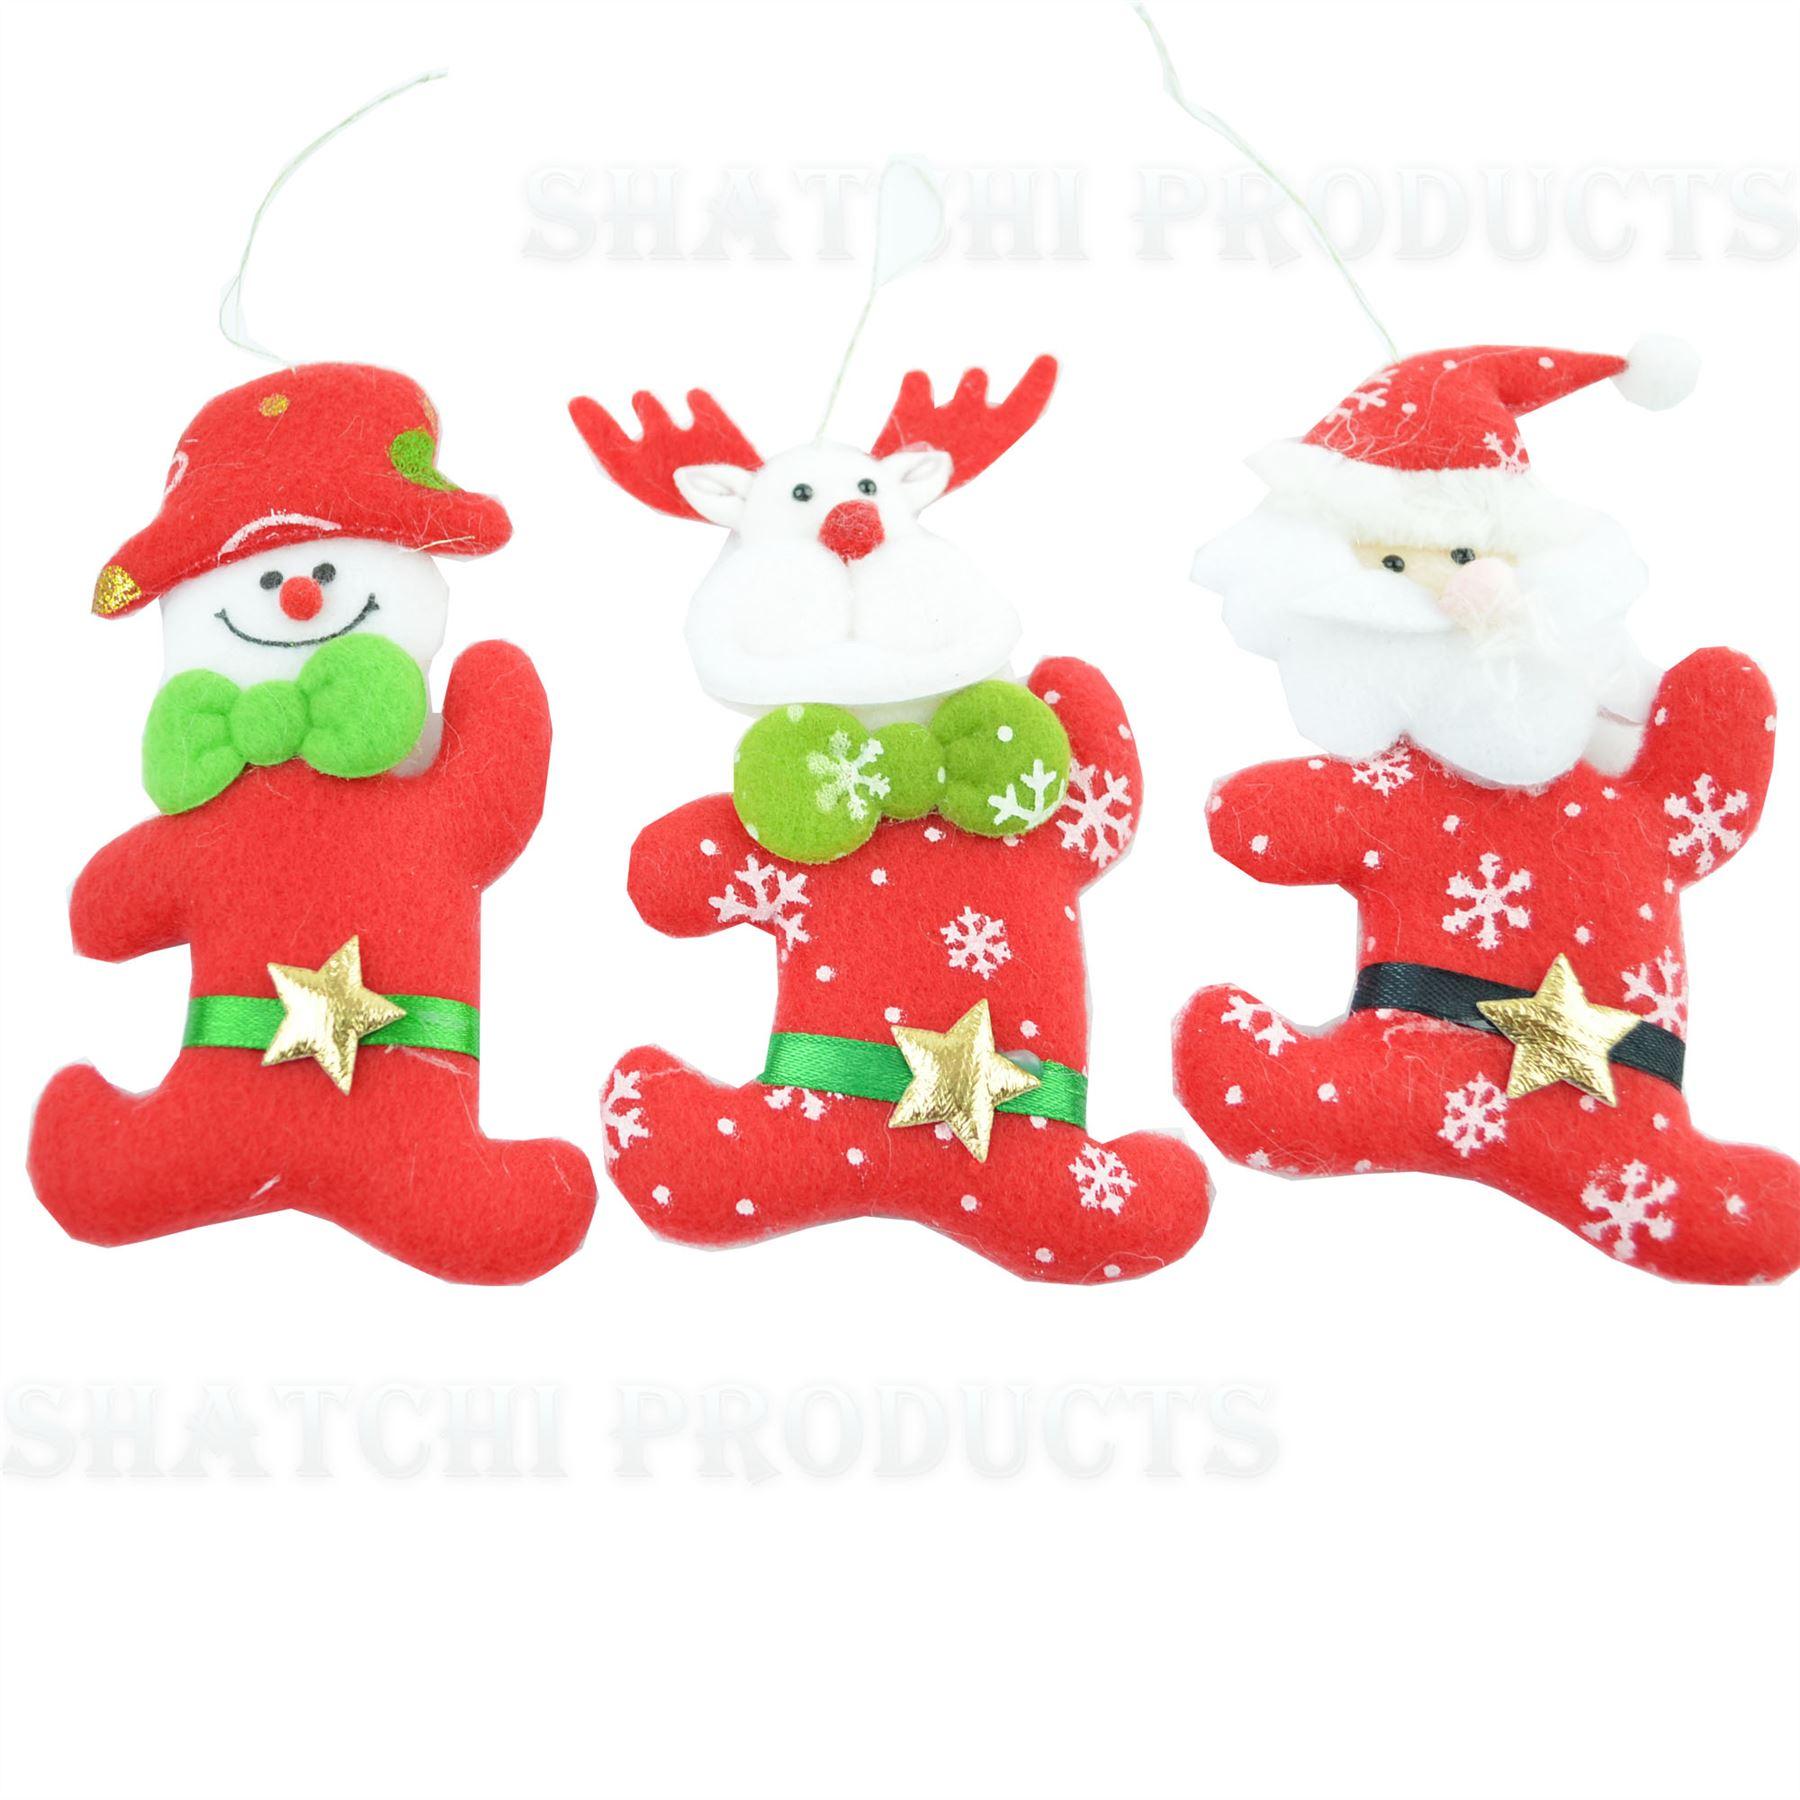 Christmas-Tree-Hanging-Decorations-Glitter-Snowman-Xmas-Beads-Chain-Garland thumbnail 21